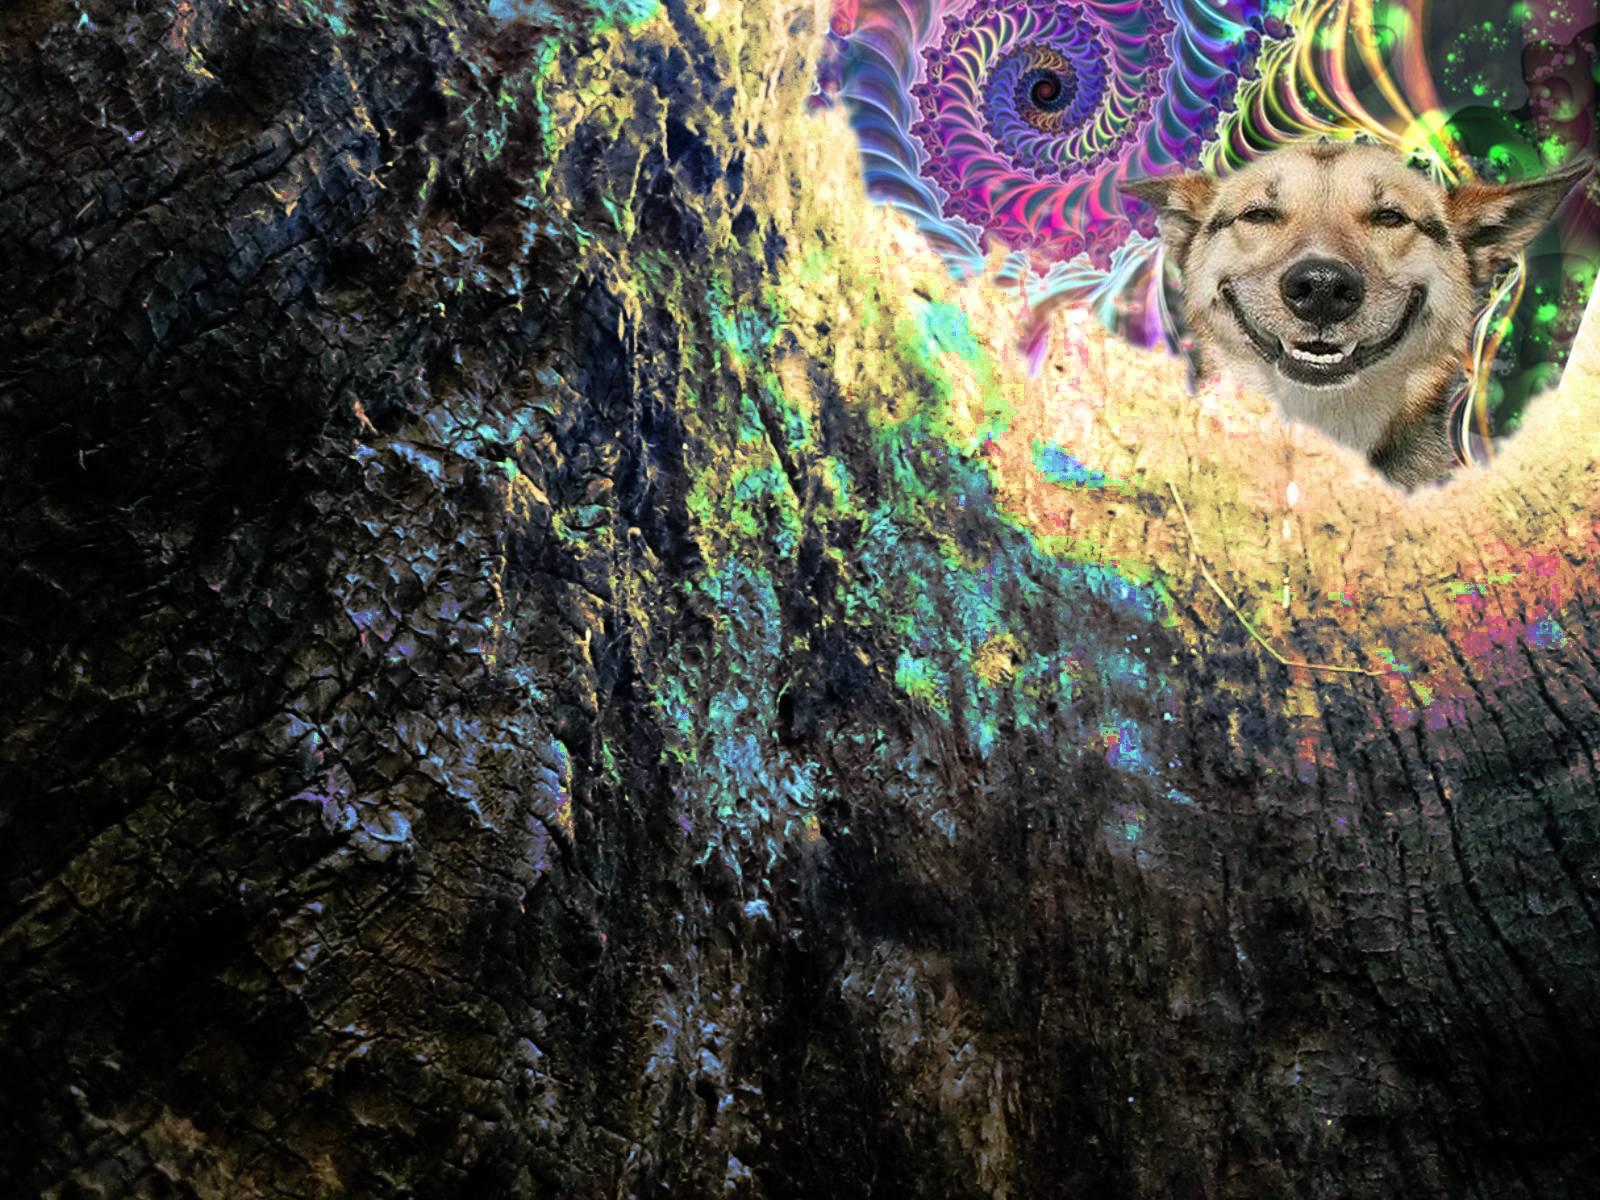 Stoner Wallpapers - Wallpaper Cave